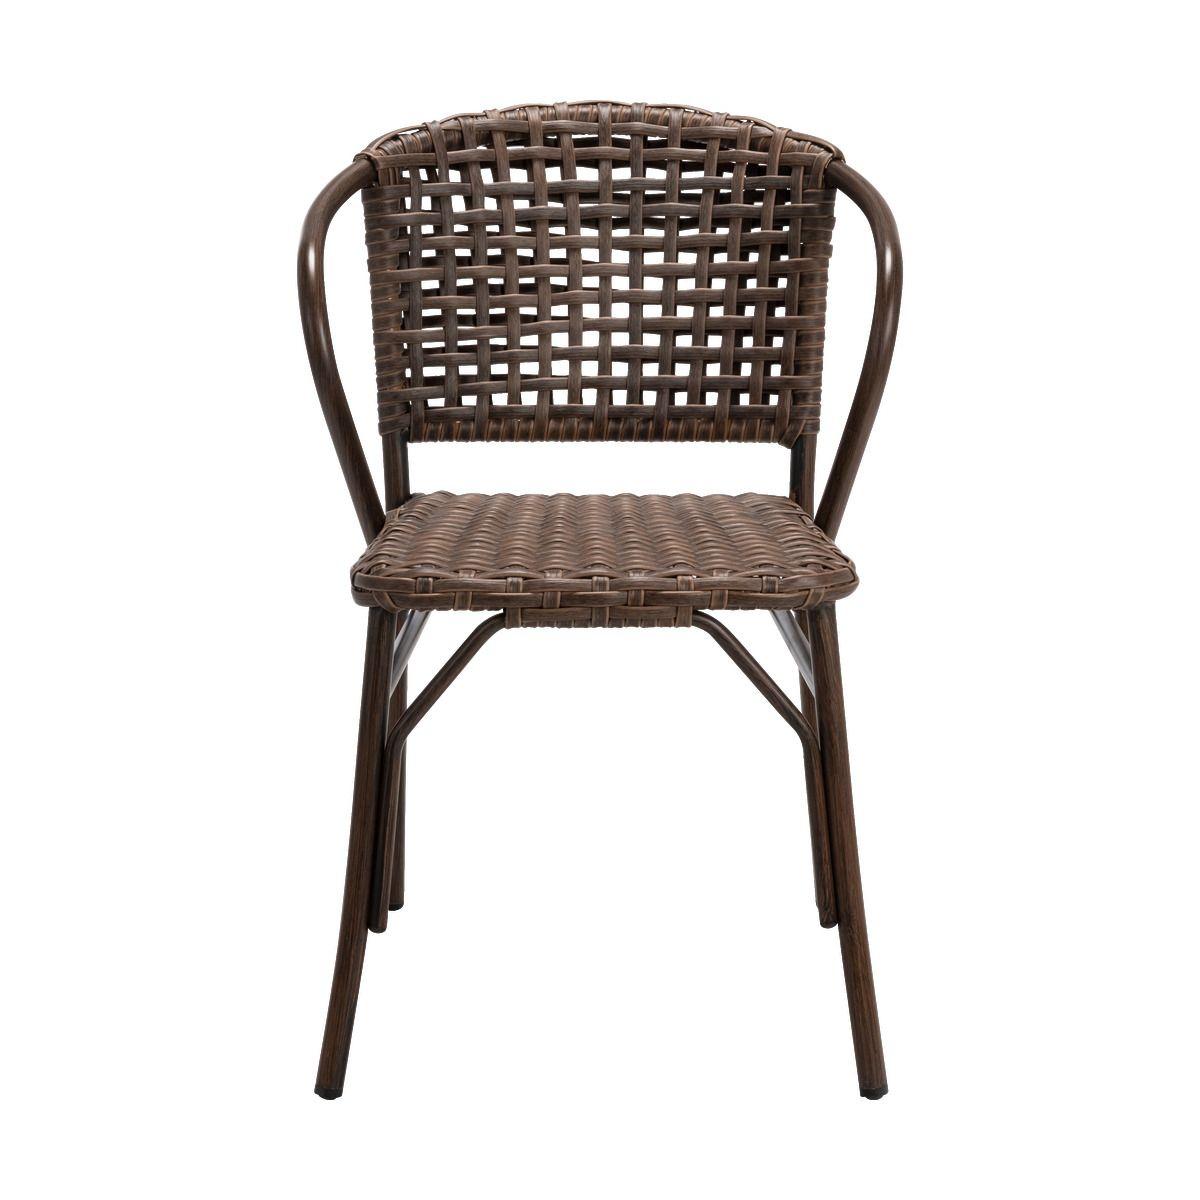 Chaise De Jardin En Aluminium Brun - Alinéa | Chaise, Table ... concernant Alinea Chaise Jardin